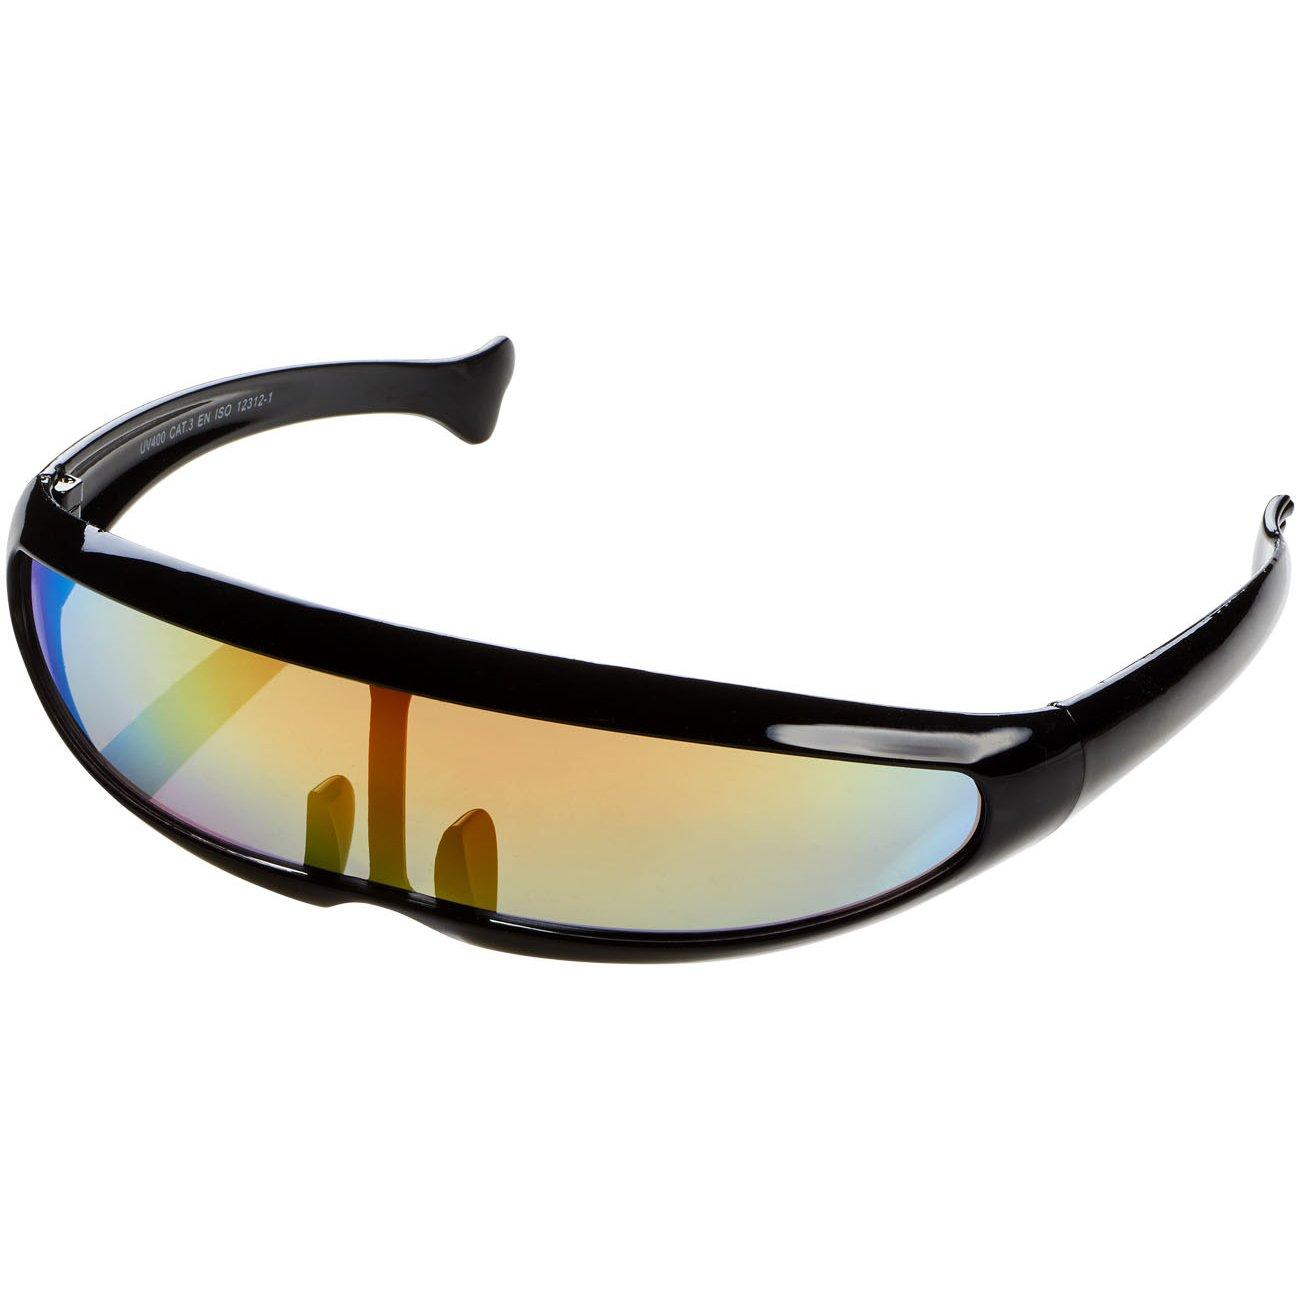 Bullet Planga sunglasses